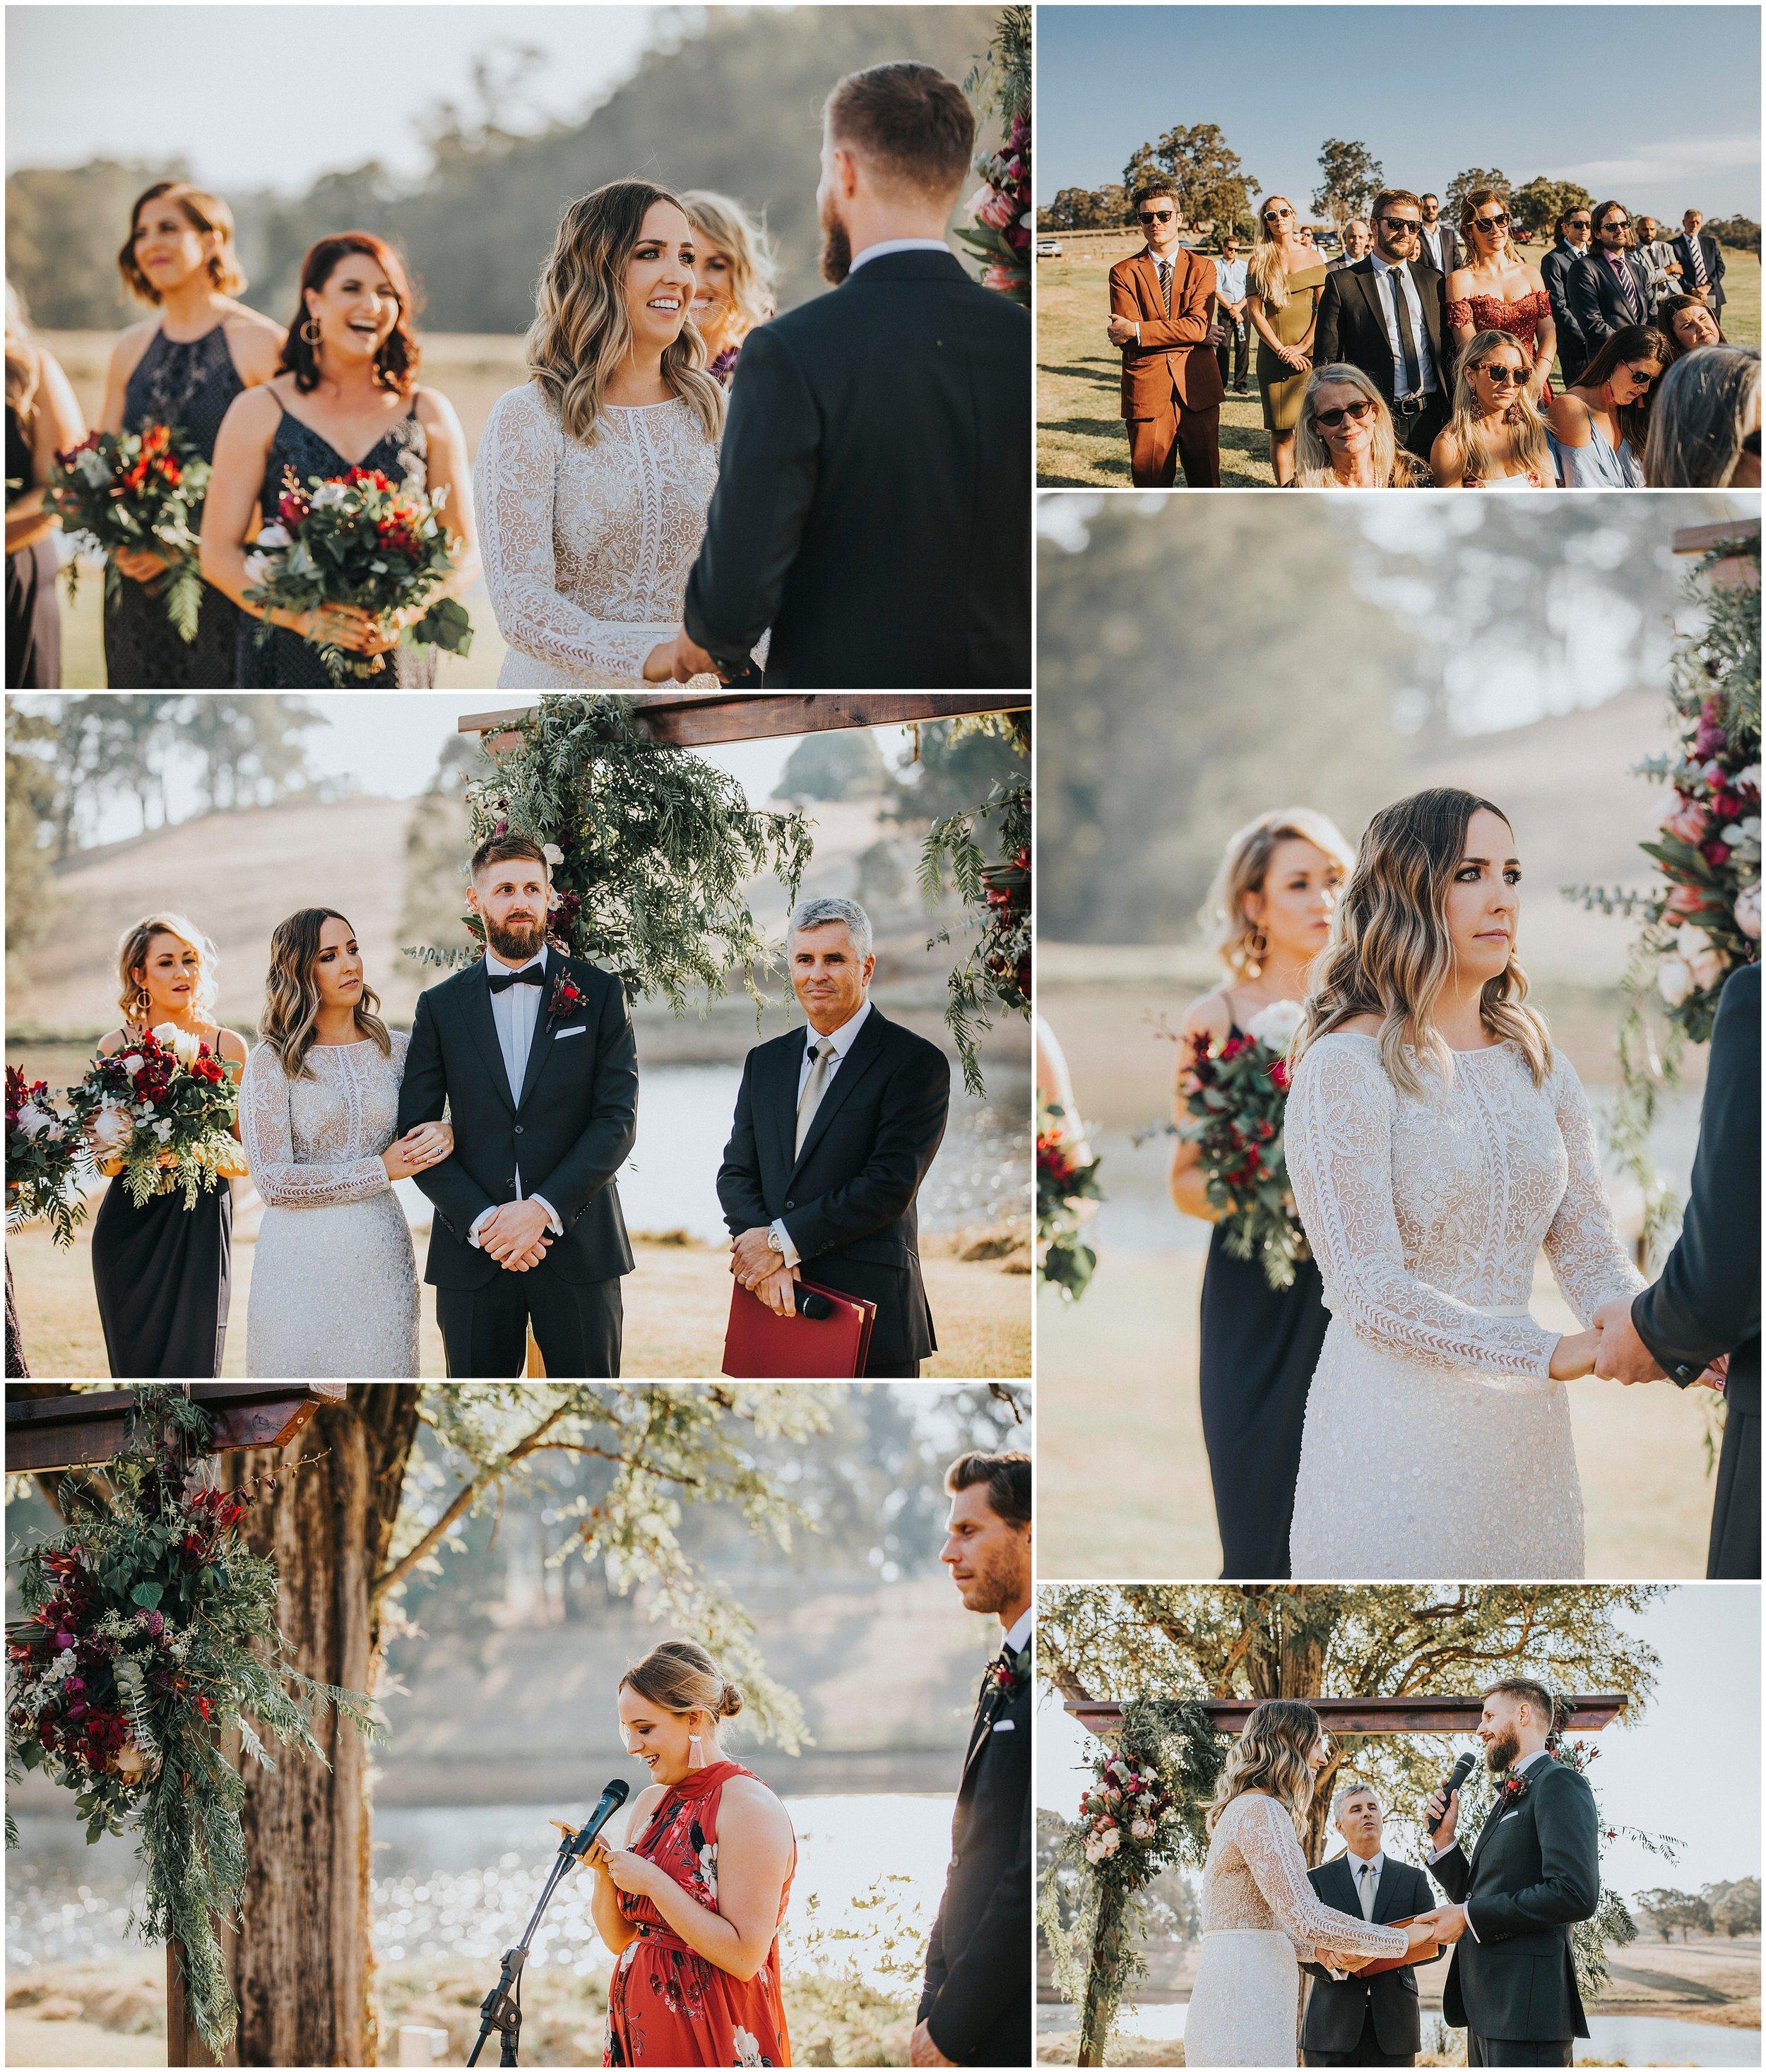 ferguson_valley_perth_wedding_photgorapher_keeper_creative_14.JPG